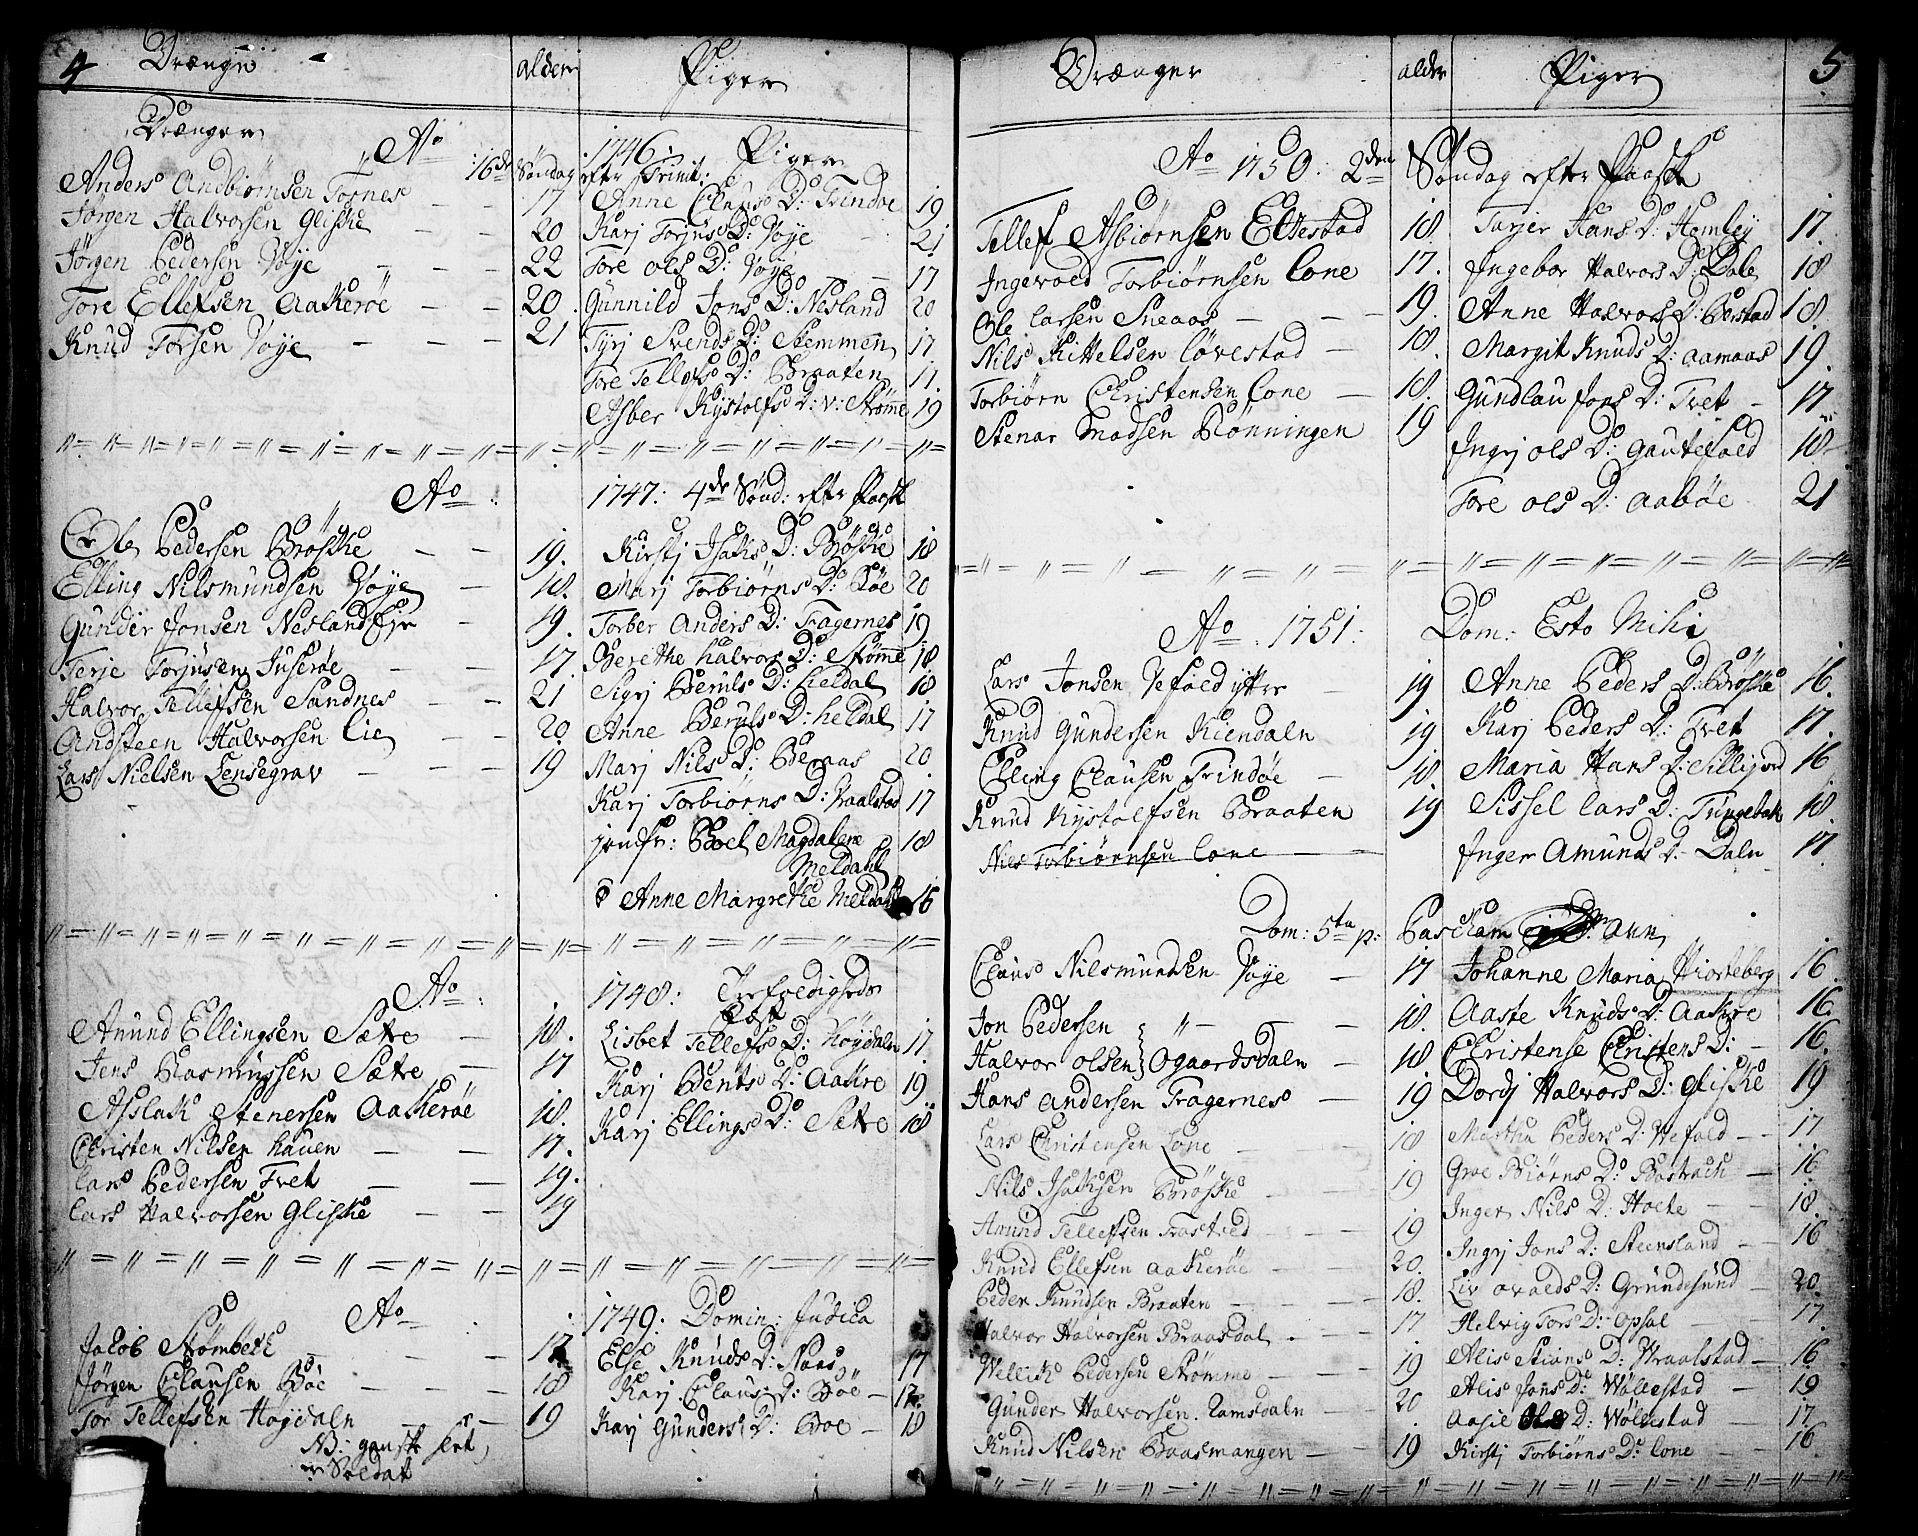 SAKO, Drangedal kirkebøker, F/Fa/L0001: Ministerialbok nr. 1, 1697-1767, s. 4-5